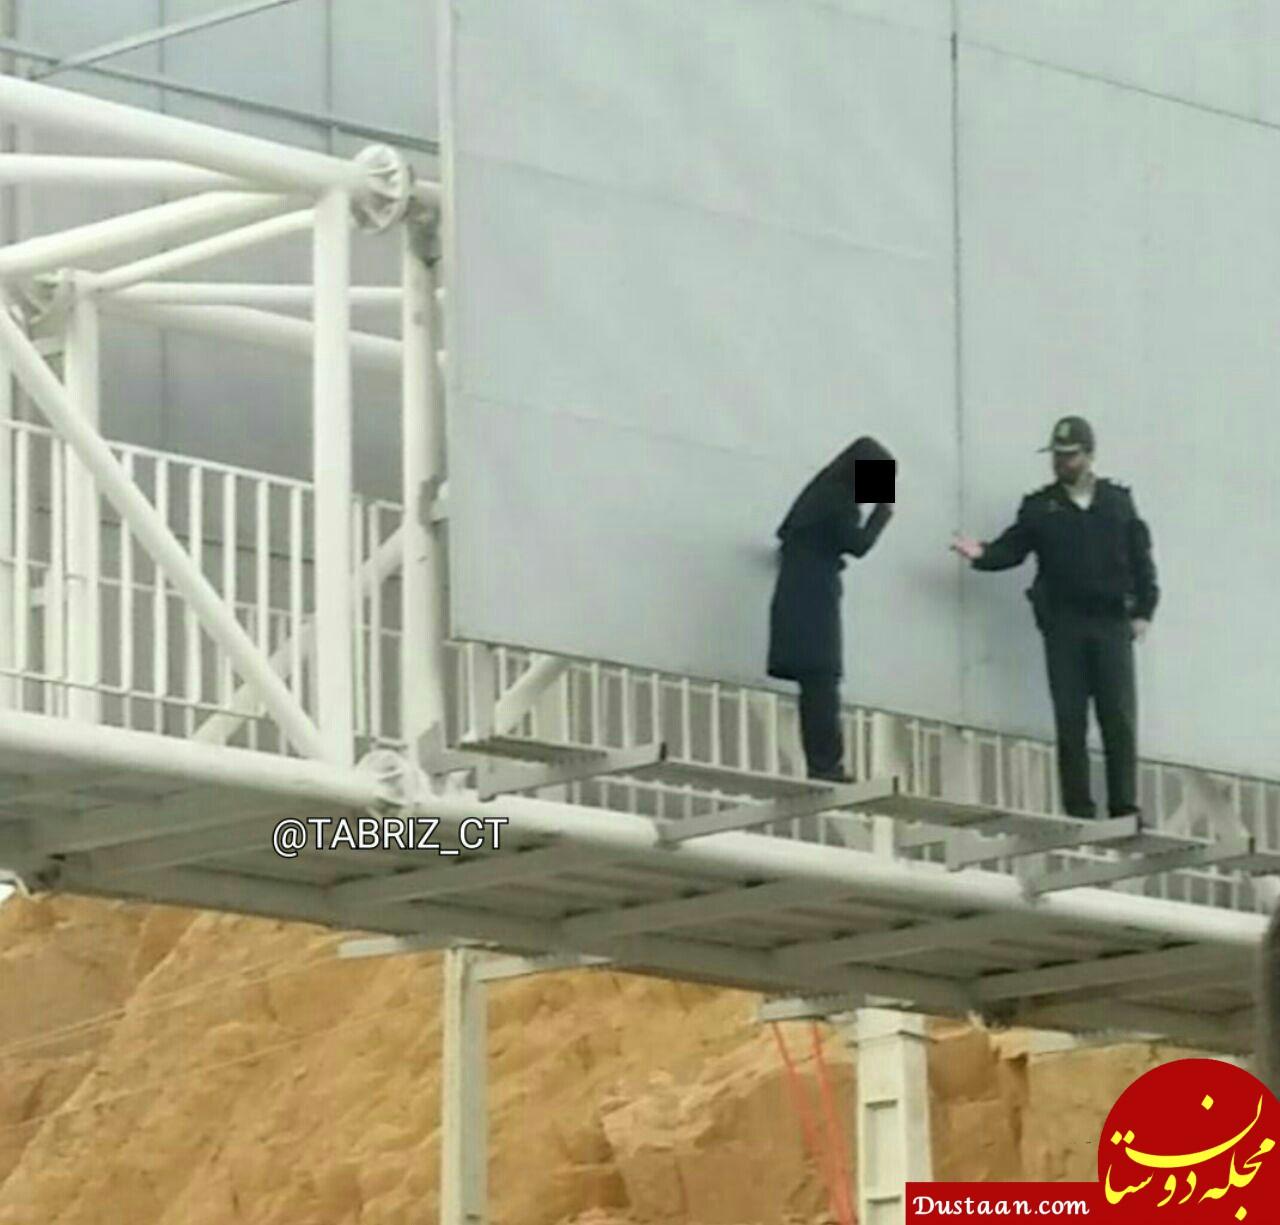 www.dustaan.com نجات دختر نوجوان تبریزی از خودکشی